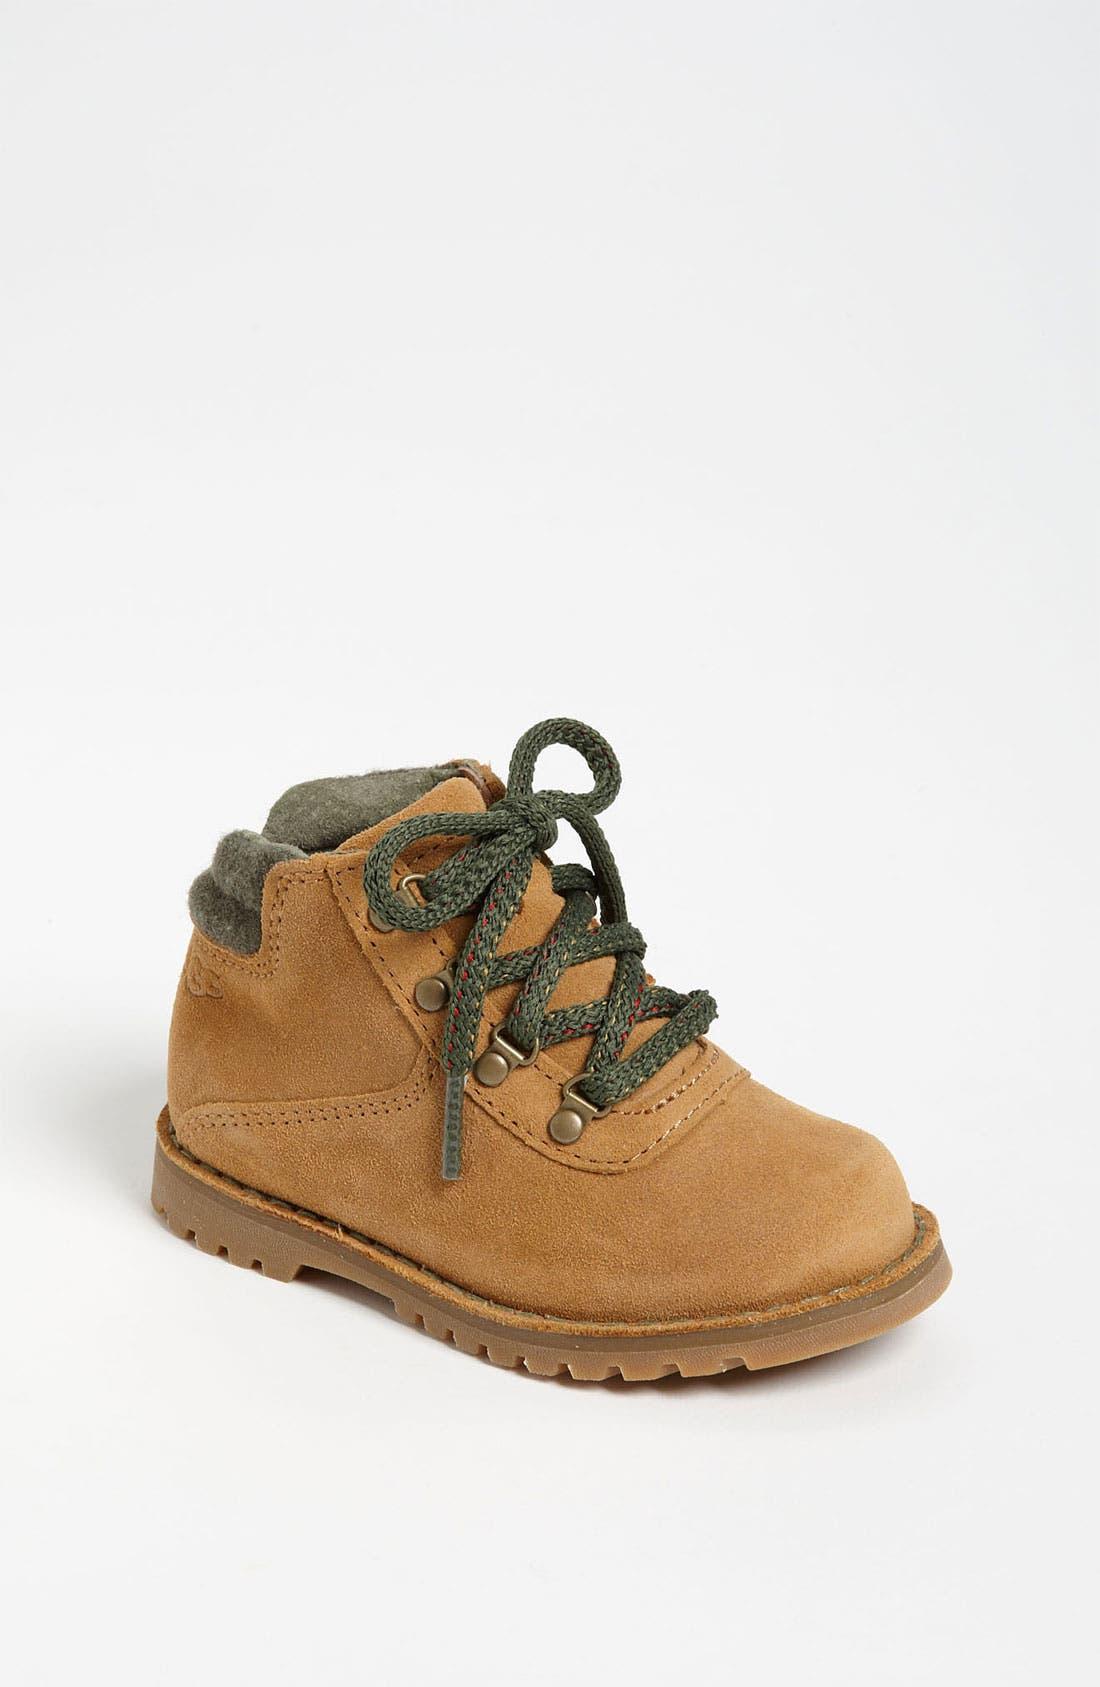 Main Image - UGG® Australia 'Payson' Boot (Walker & Toddler)